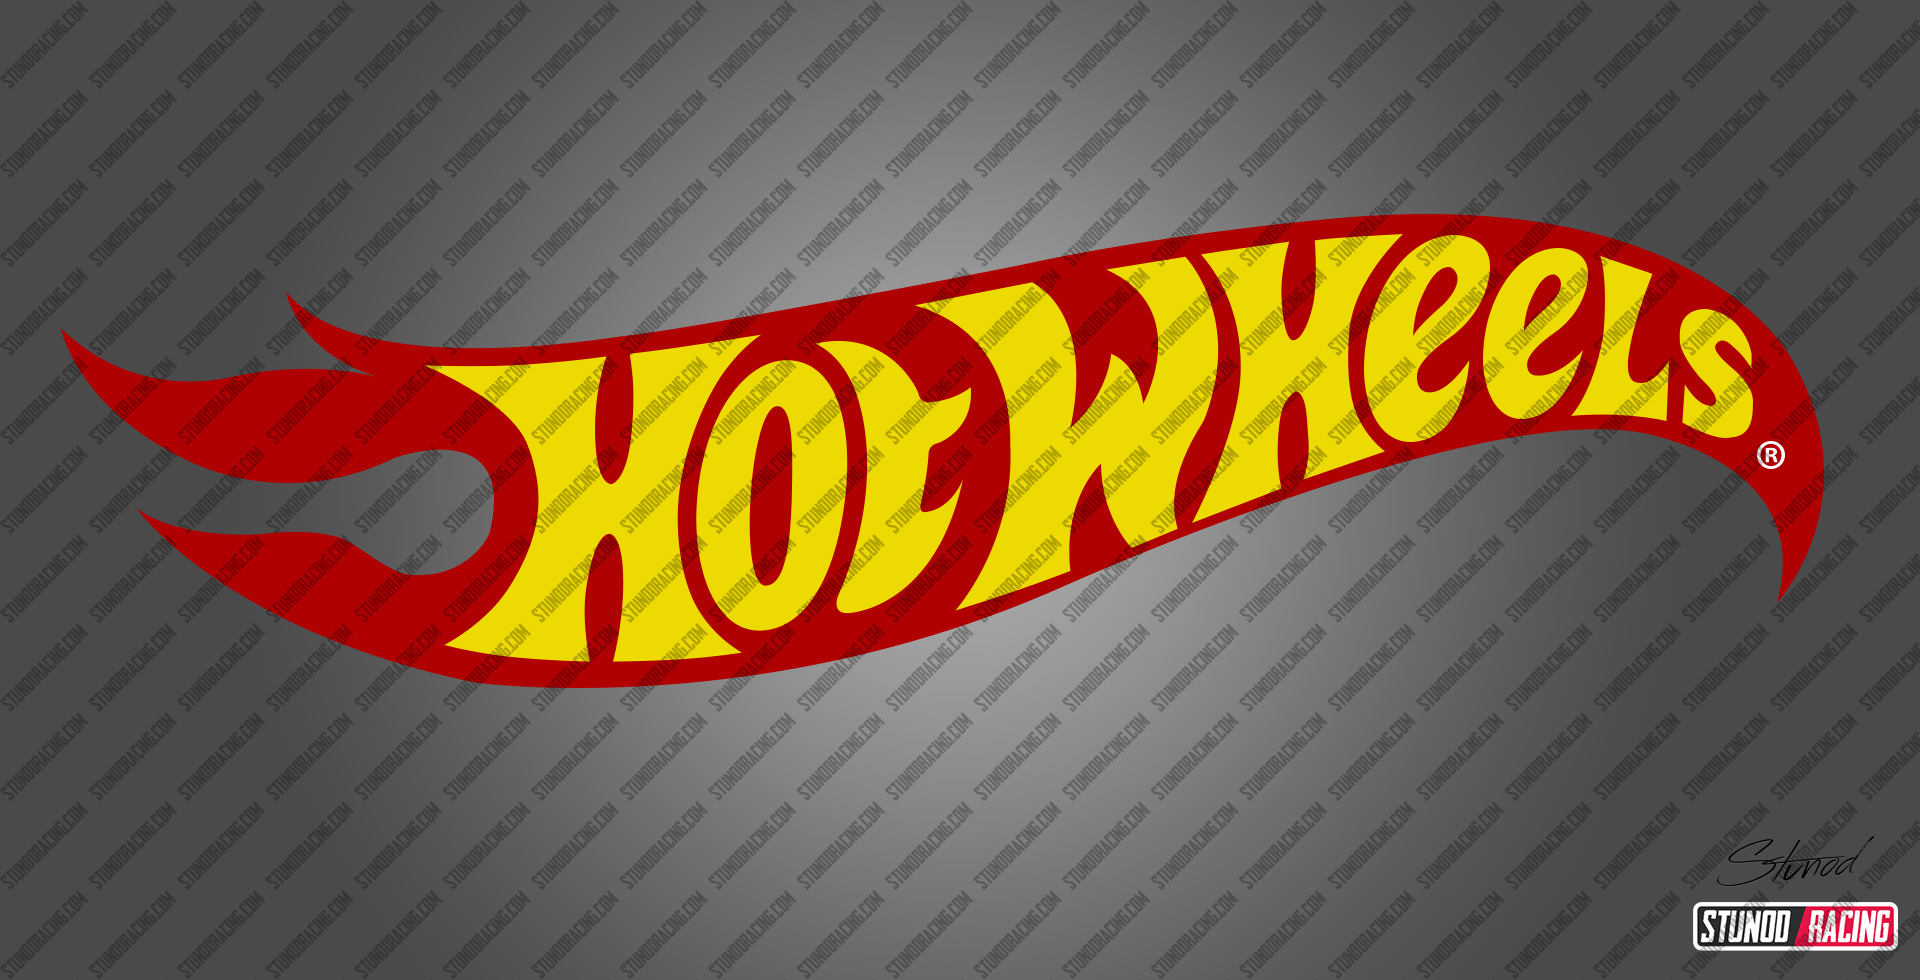 hotwheels logo stunod racing. Black Bedroom Furniture Sets. Home Design Ideas